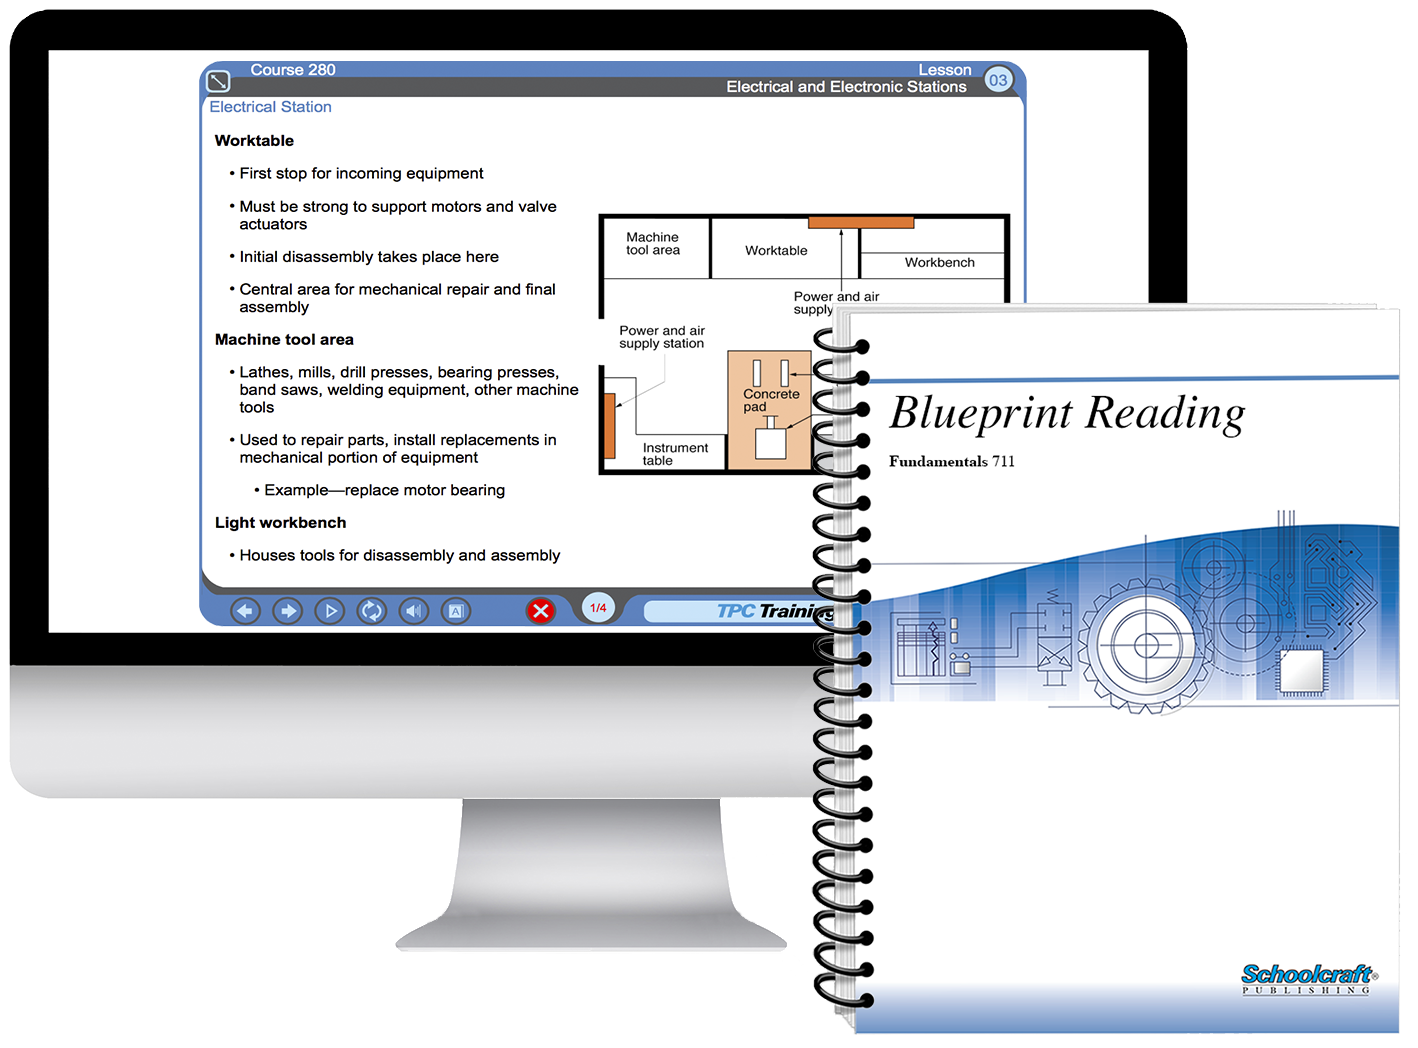 blueprint reading software images blueprint design and